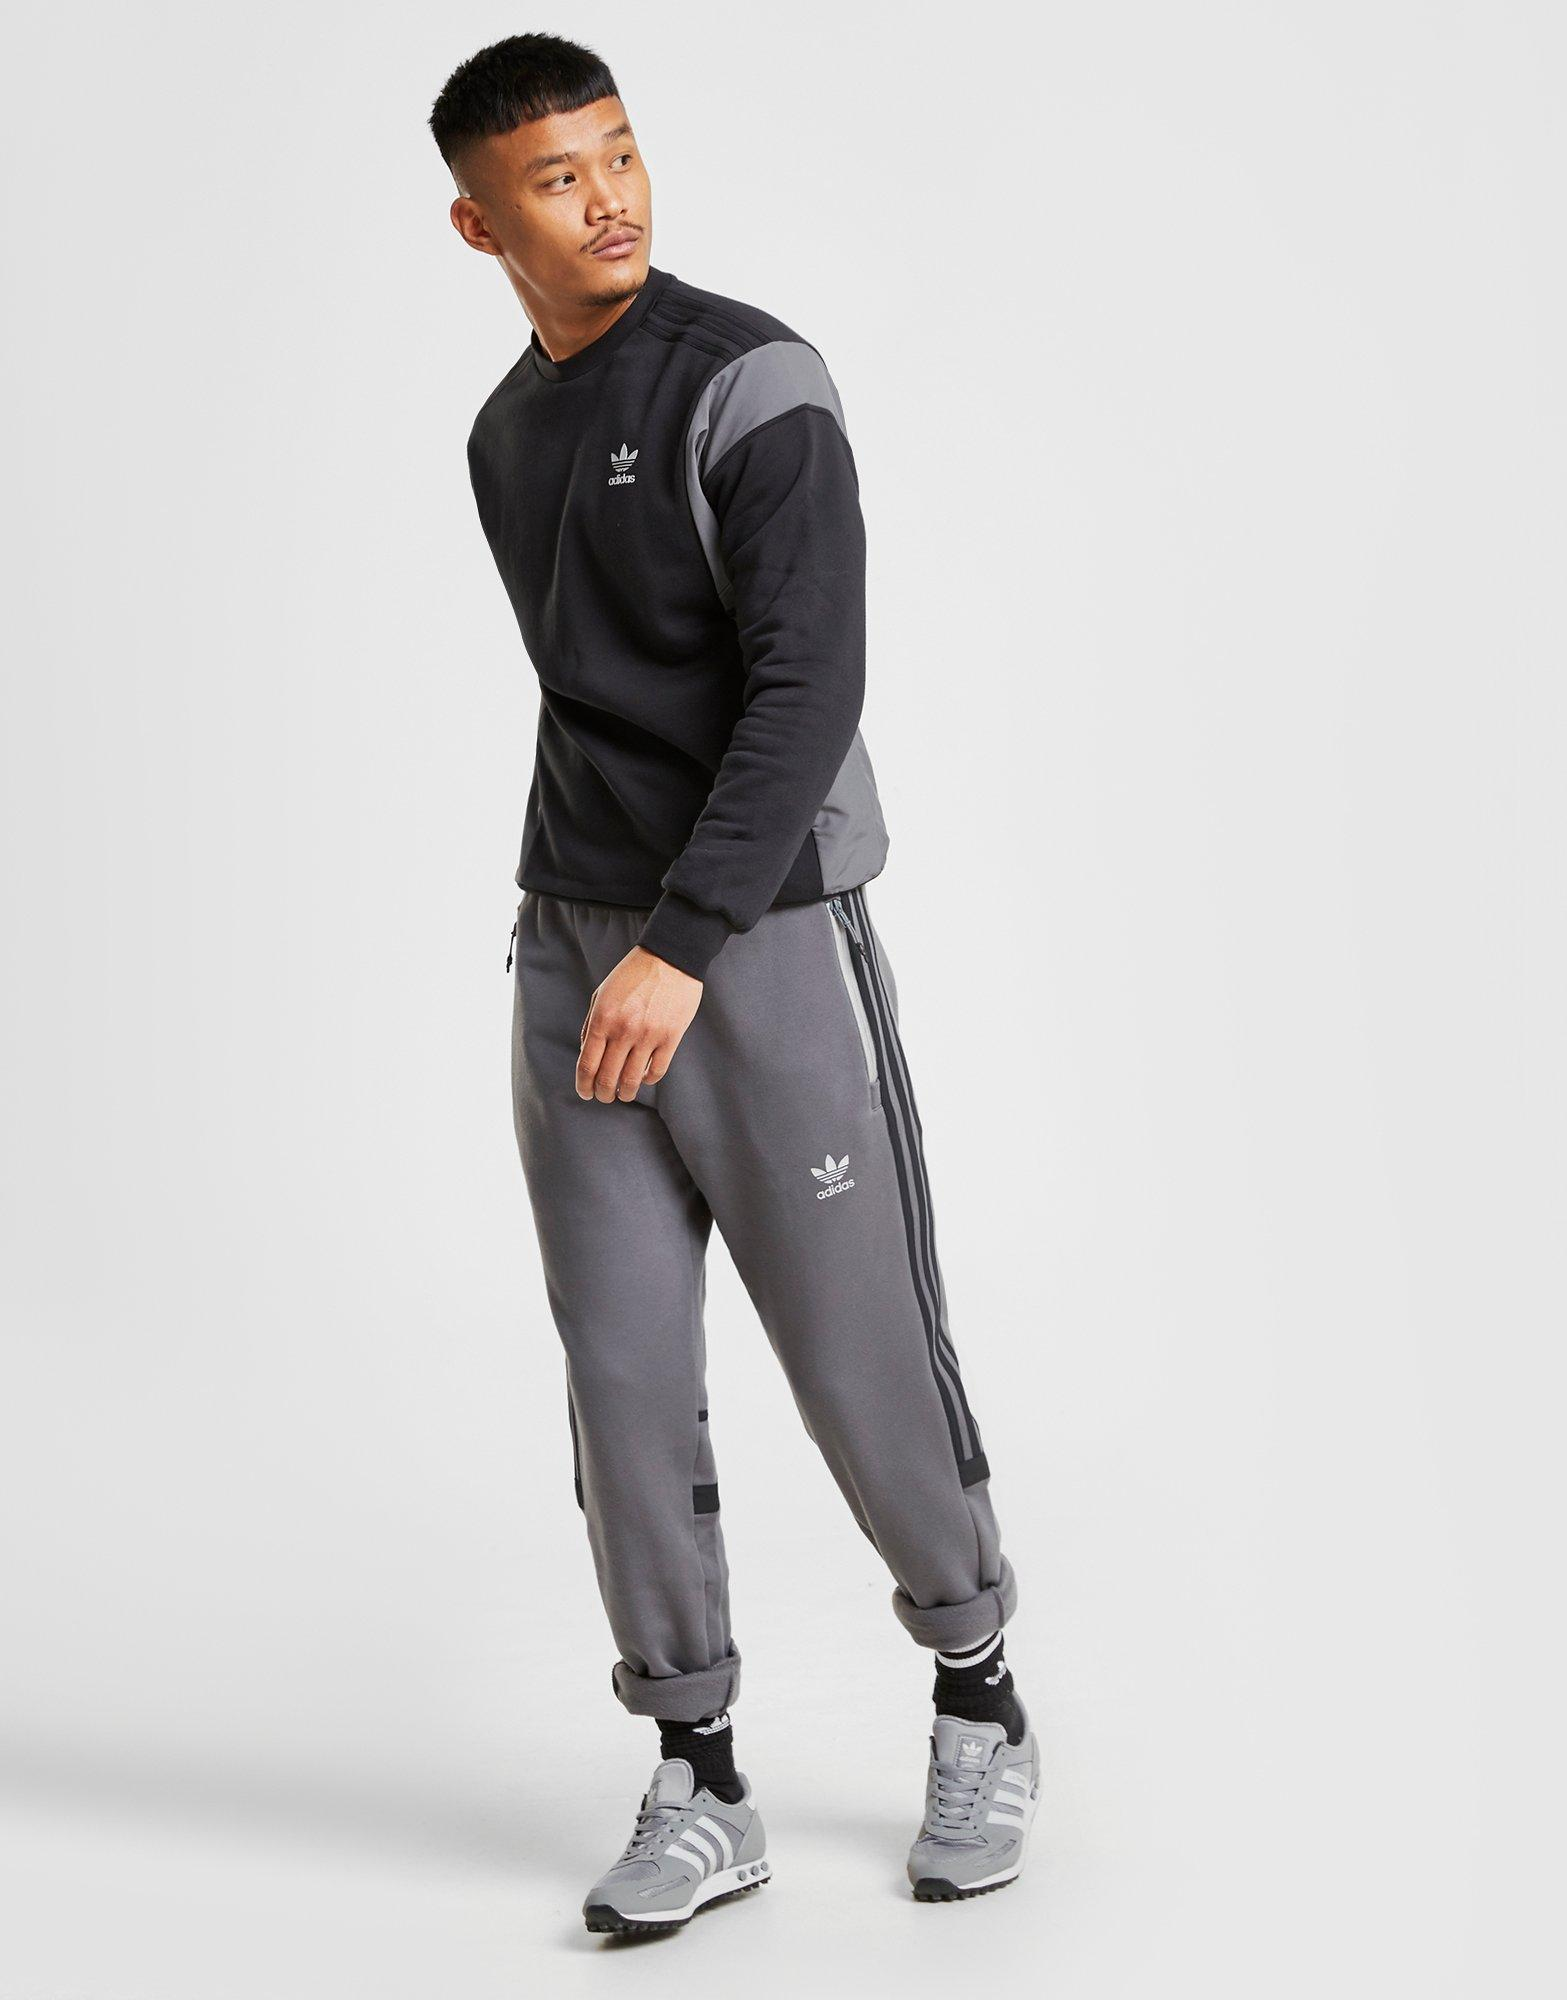 Run Crew Sweatshirt in Black/Grey (Gray